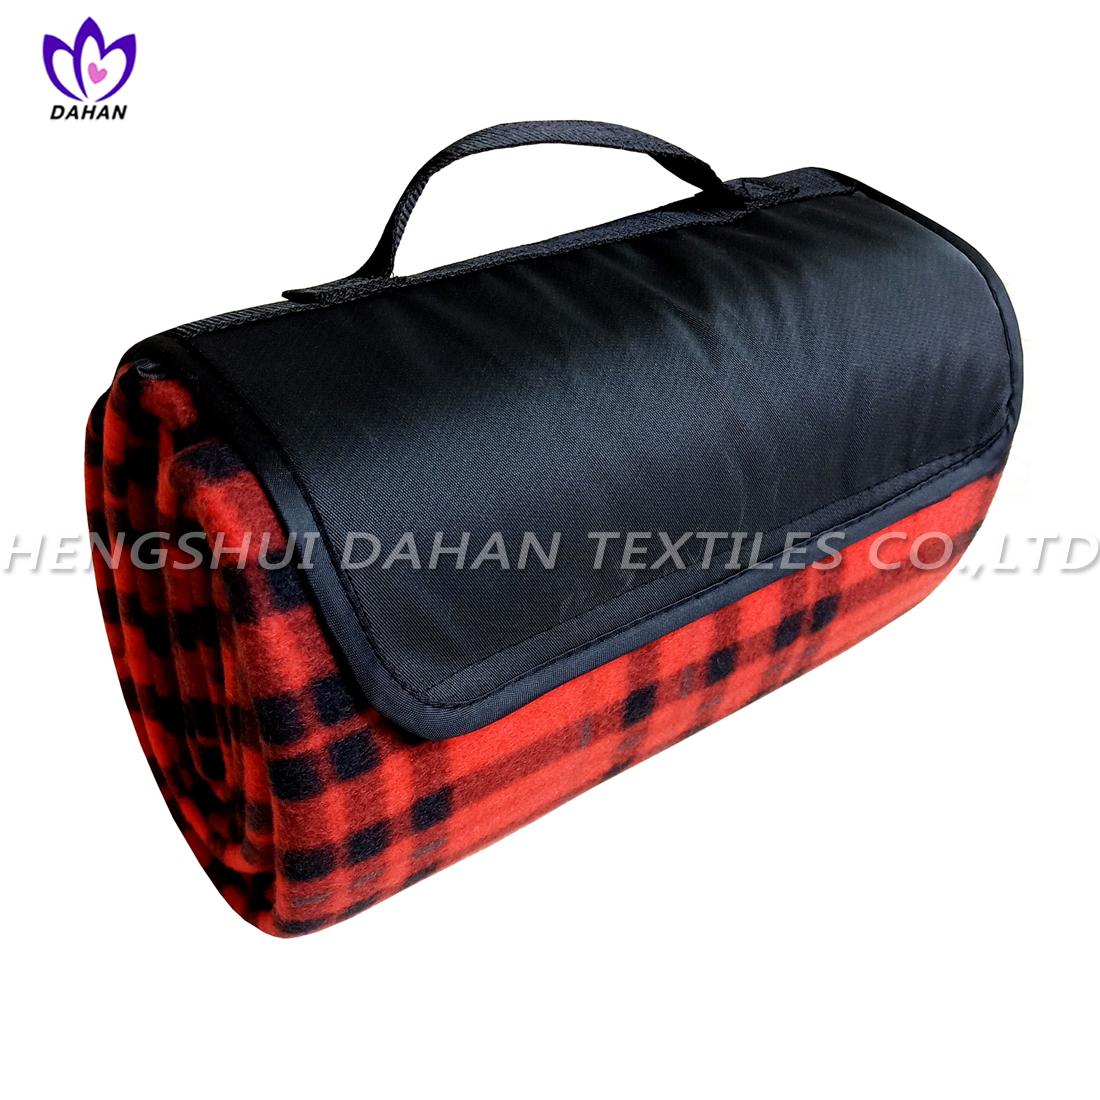 Picnic blanket waterproof picnic mat with printing.PM16